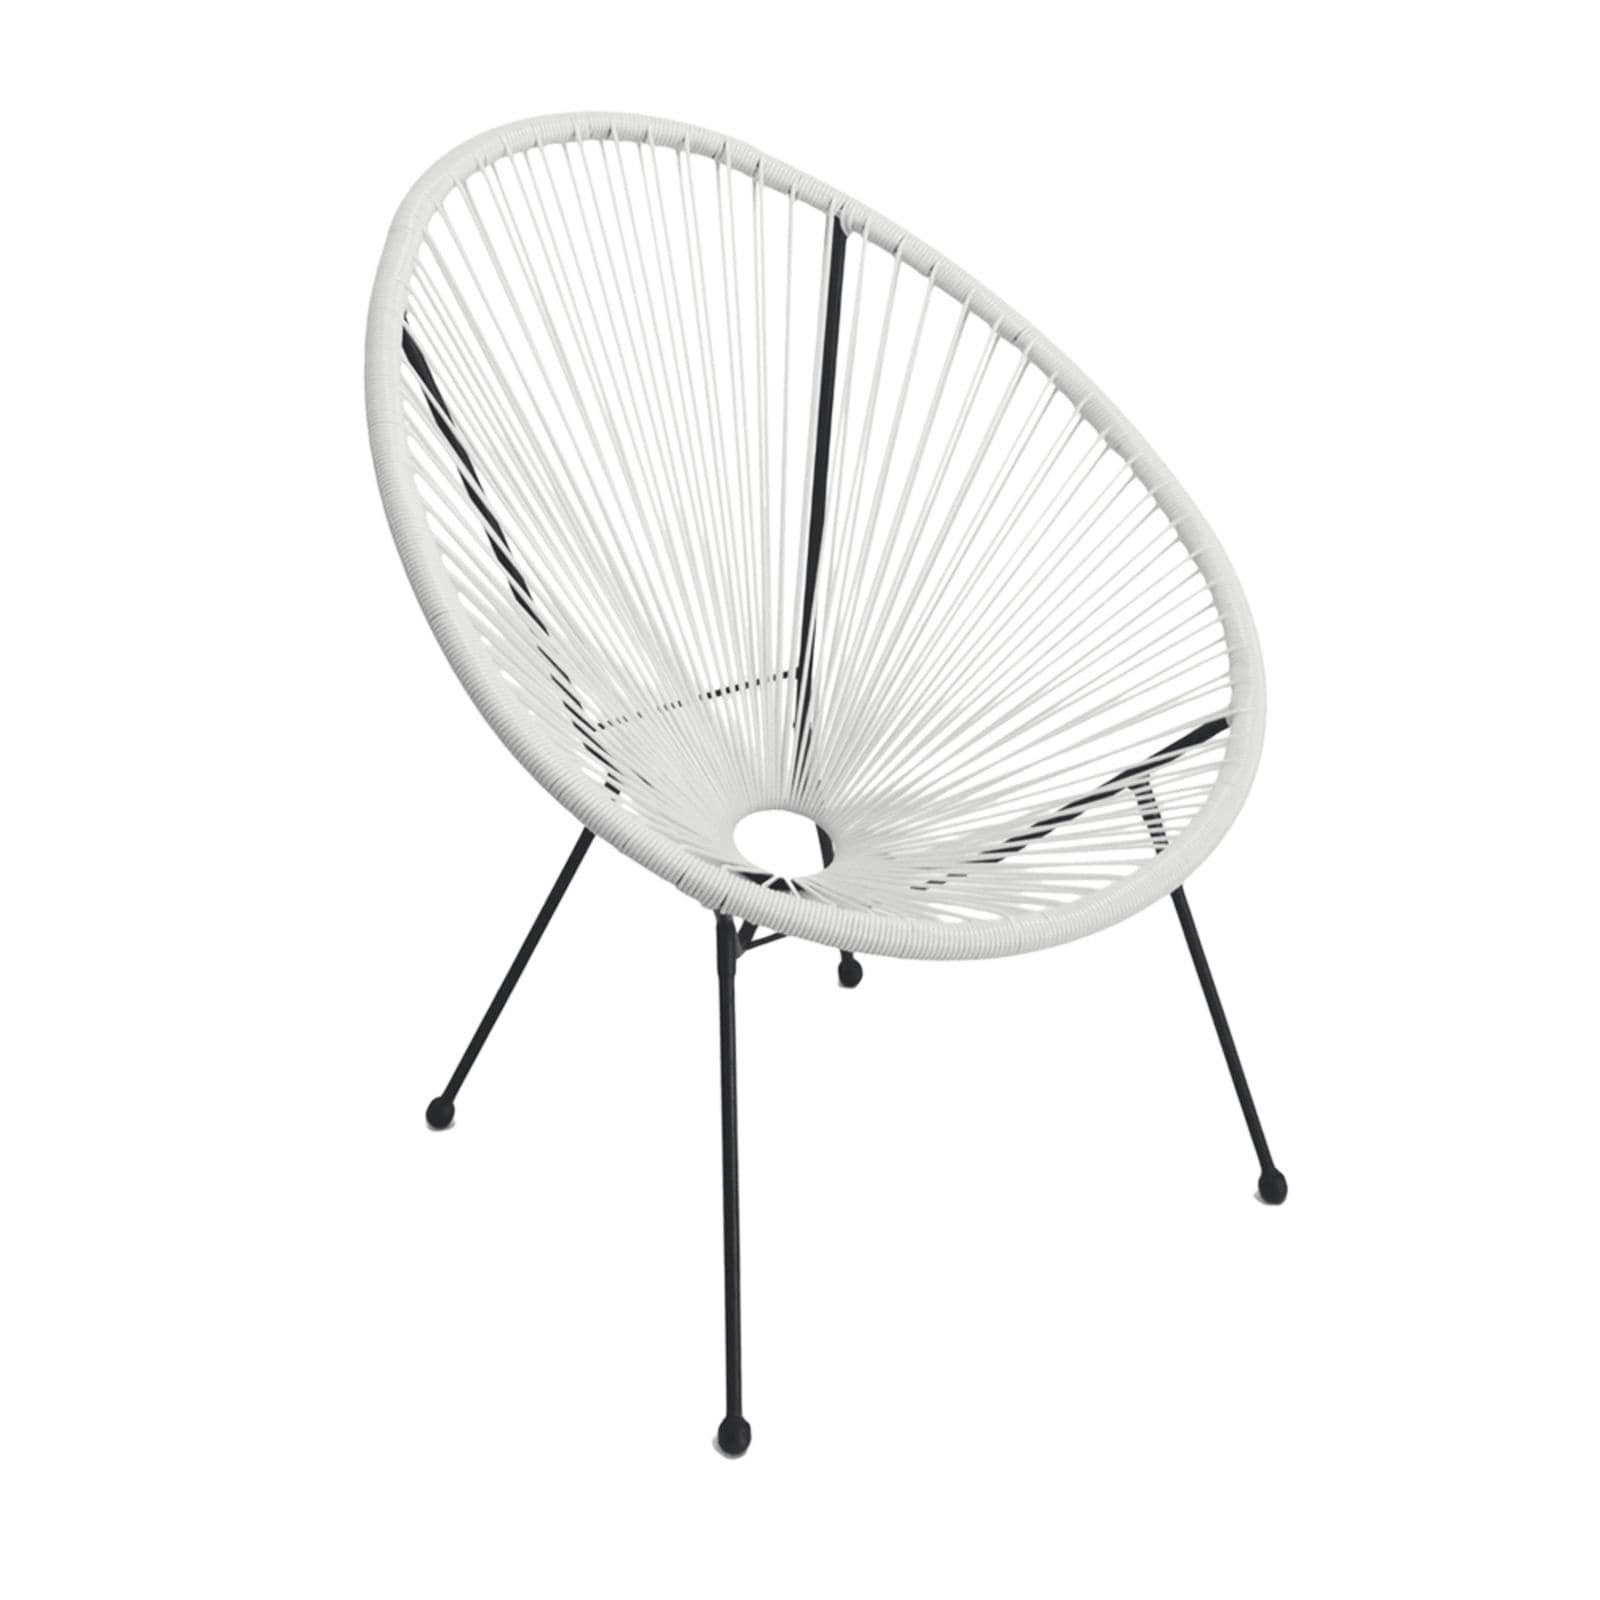 Tenir White Outdoor Patio Chairs